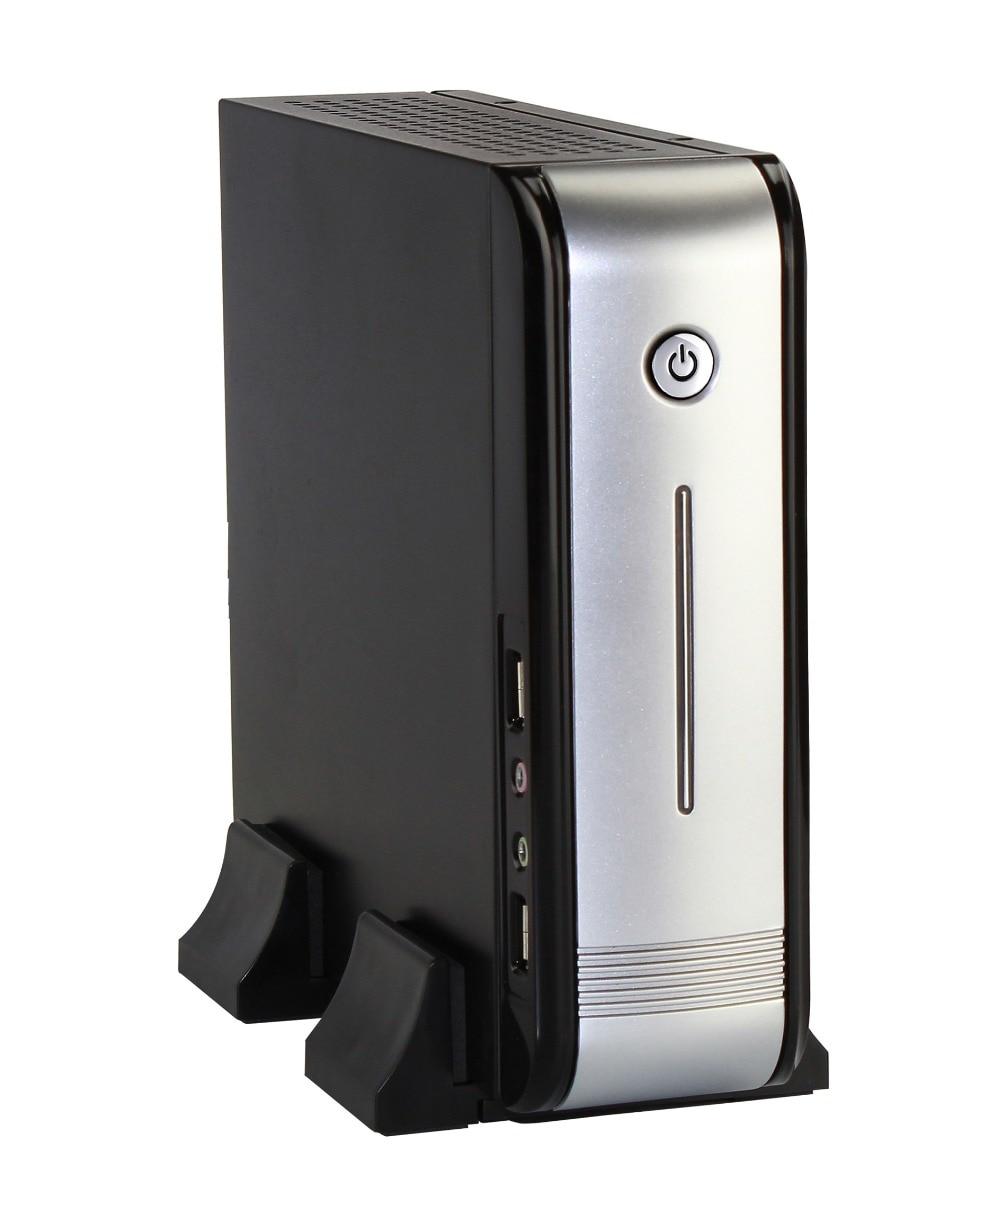 Cheap desktop computer - Aliexpress Com Buy Realan 3015 Mini Itx Commercial Desktop Computer Sgcc Office Computer Cheap Desktop Pc Case Without Power Supply From Reliable Pc Case